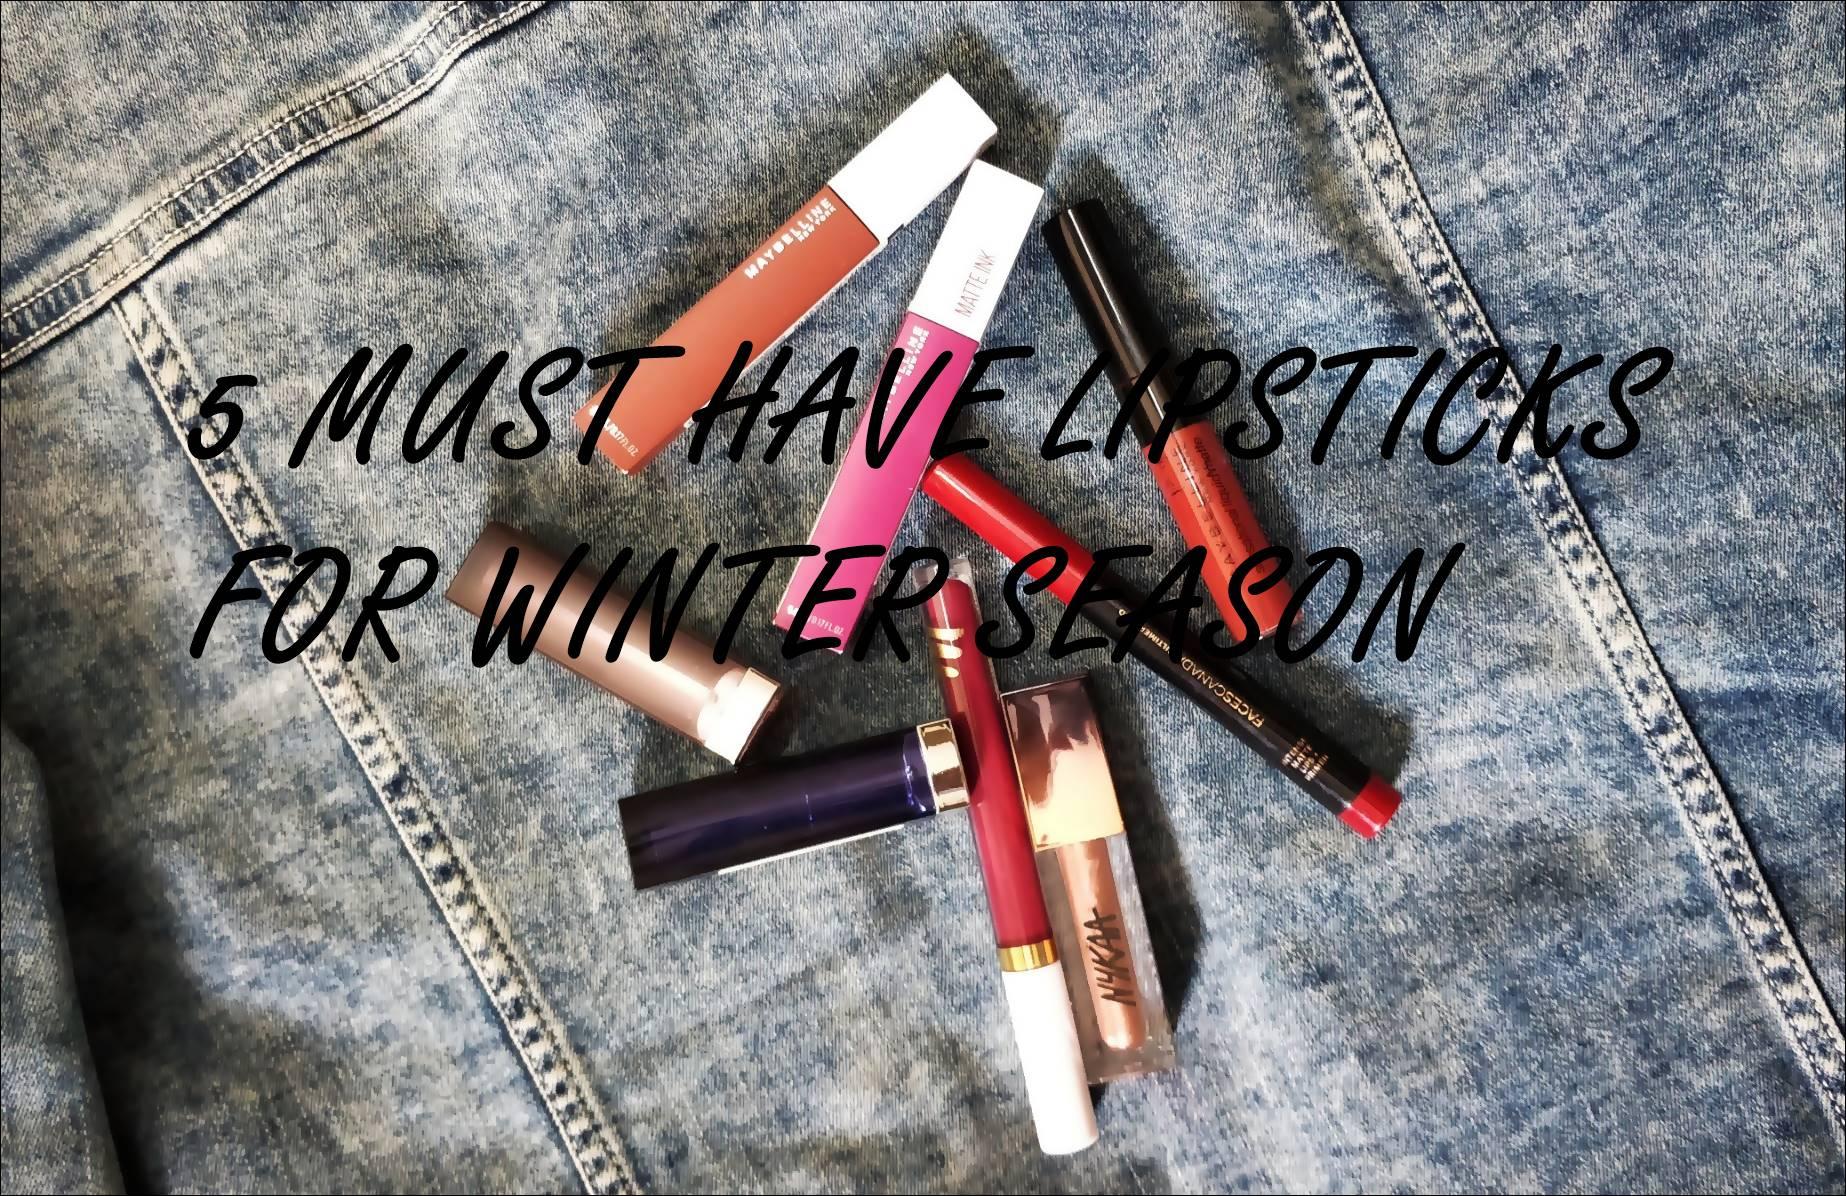 5 Must have lipsticks